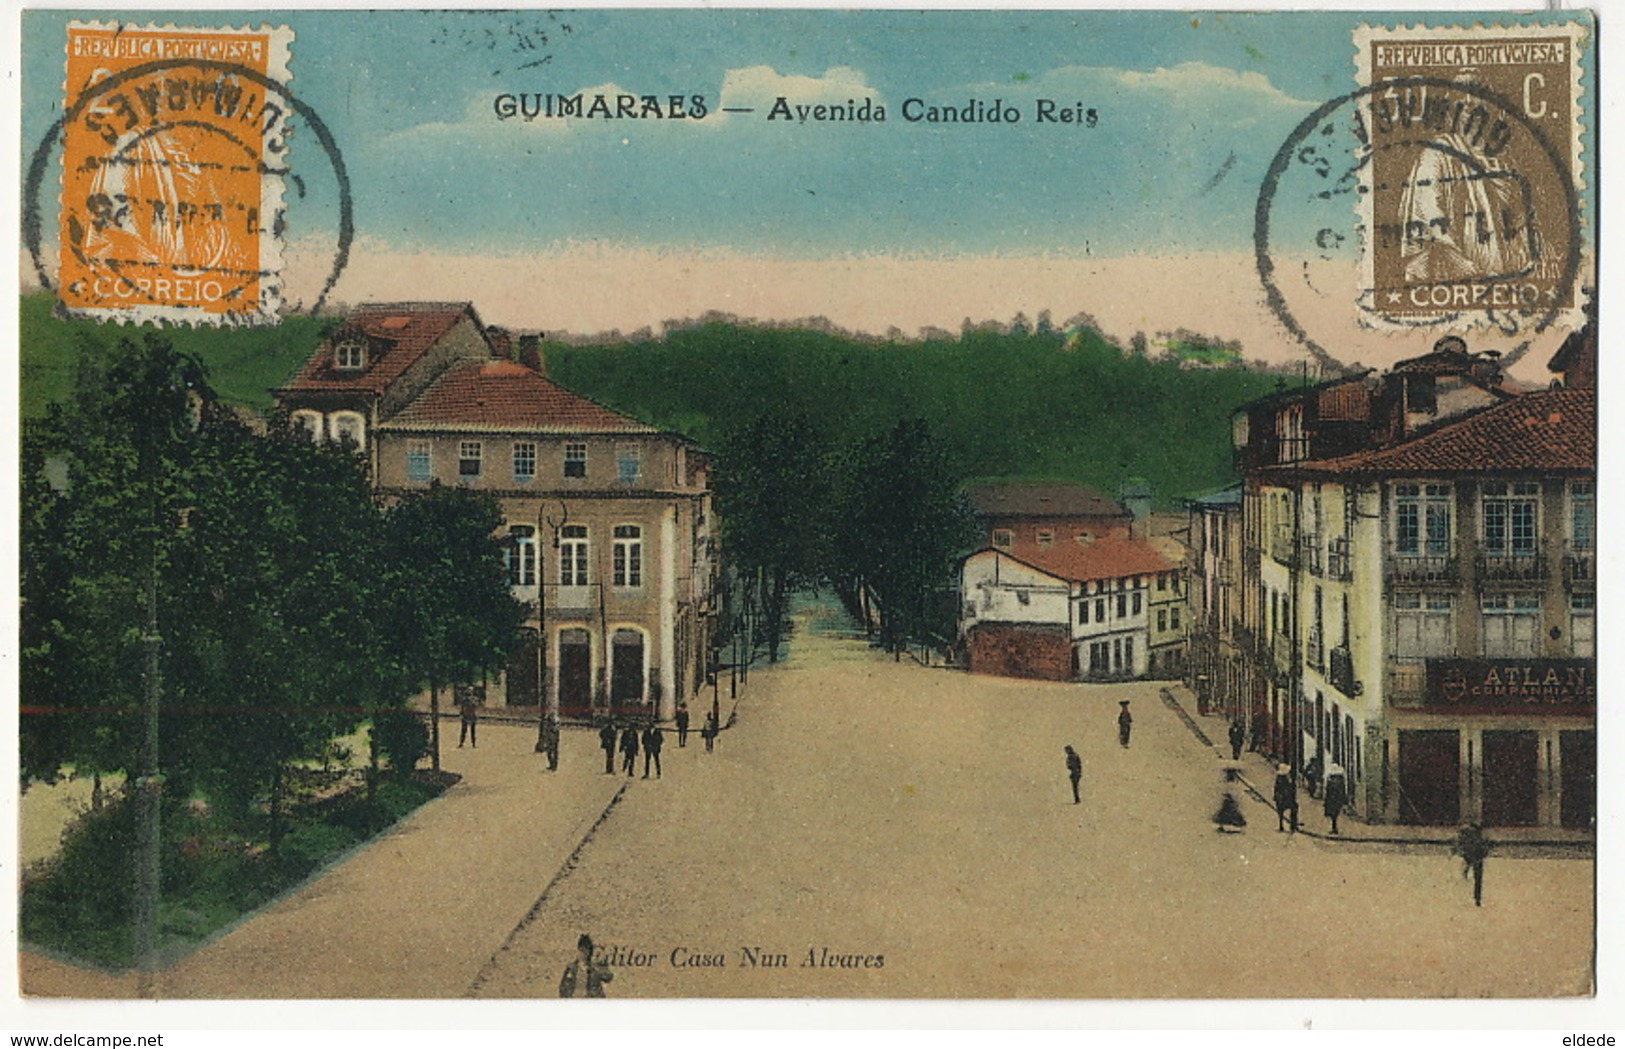 Guimaraes Avenida Candido Reis Edit Casa Nun Alvarez - Portugal